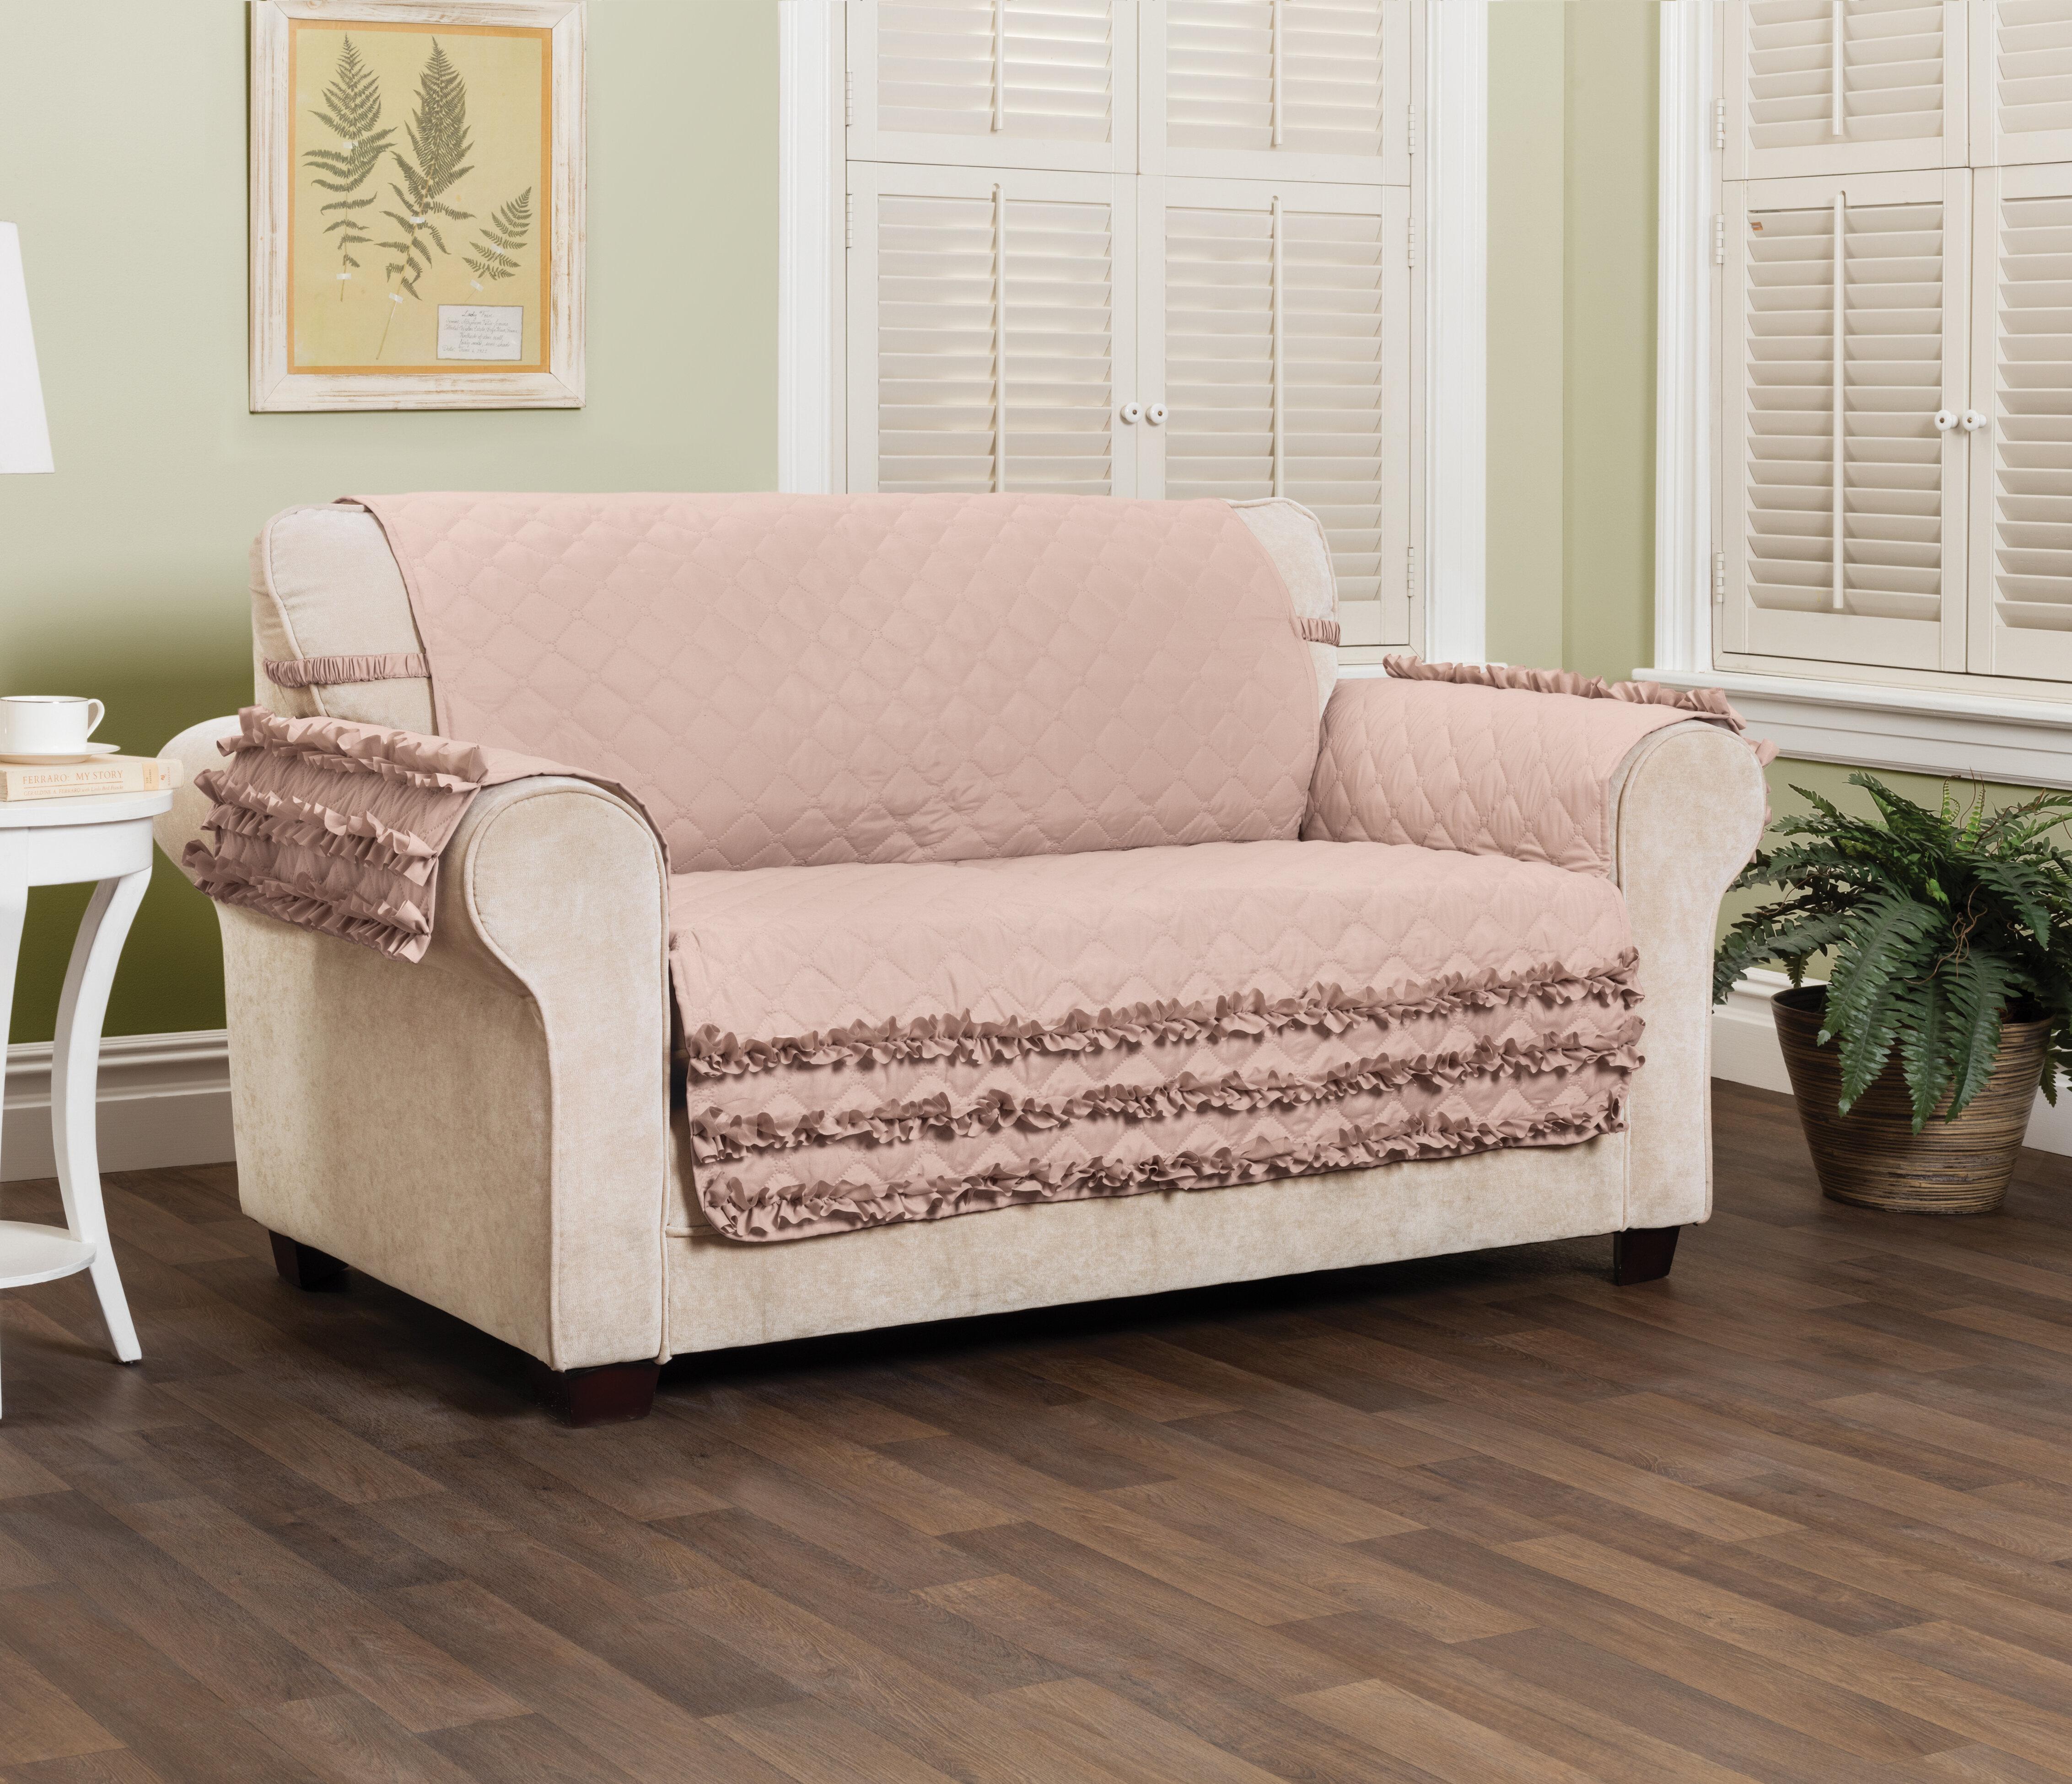 Pleasing Ruffled Box Cushion Loveseat Slipcover Pdpeps Interior Chair Design Pdpepsorg